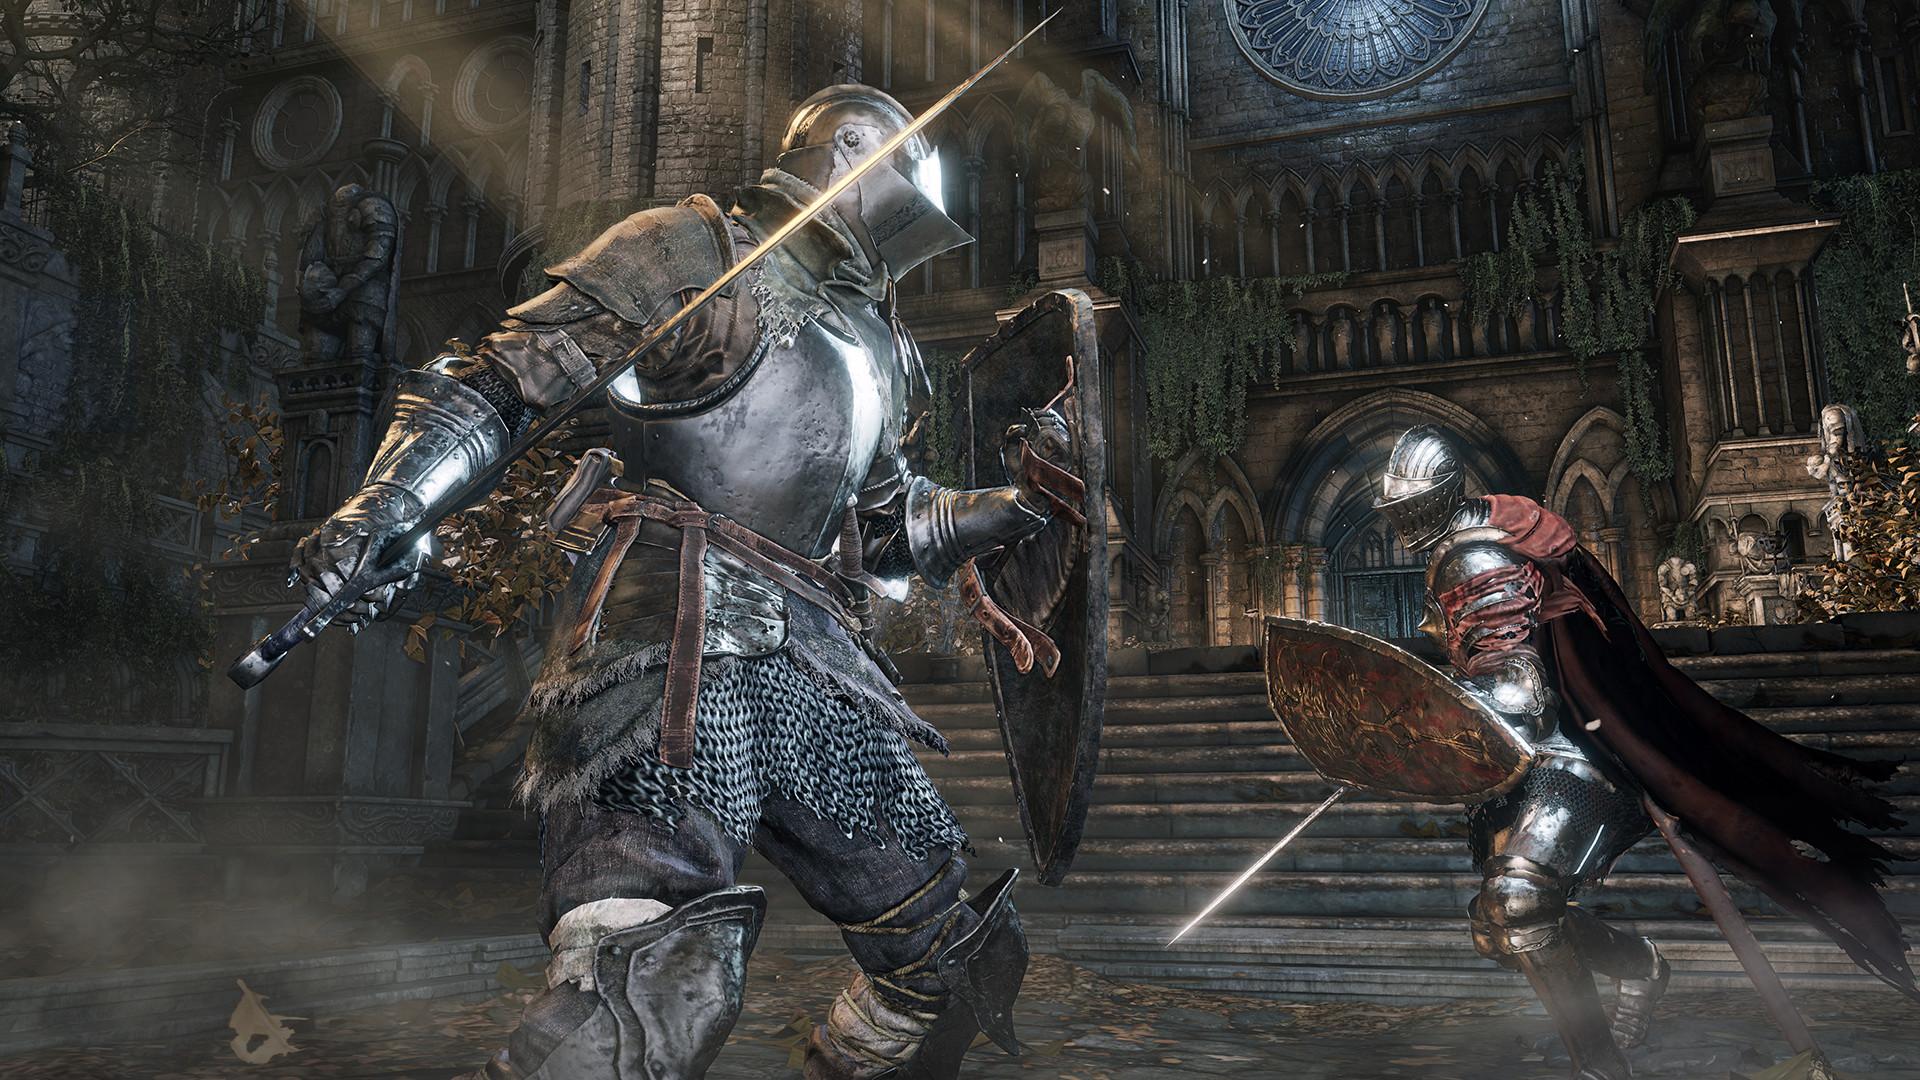 Dark Souls III (Steam key) RU CIS + gift 2019